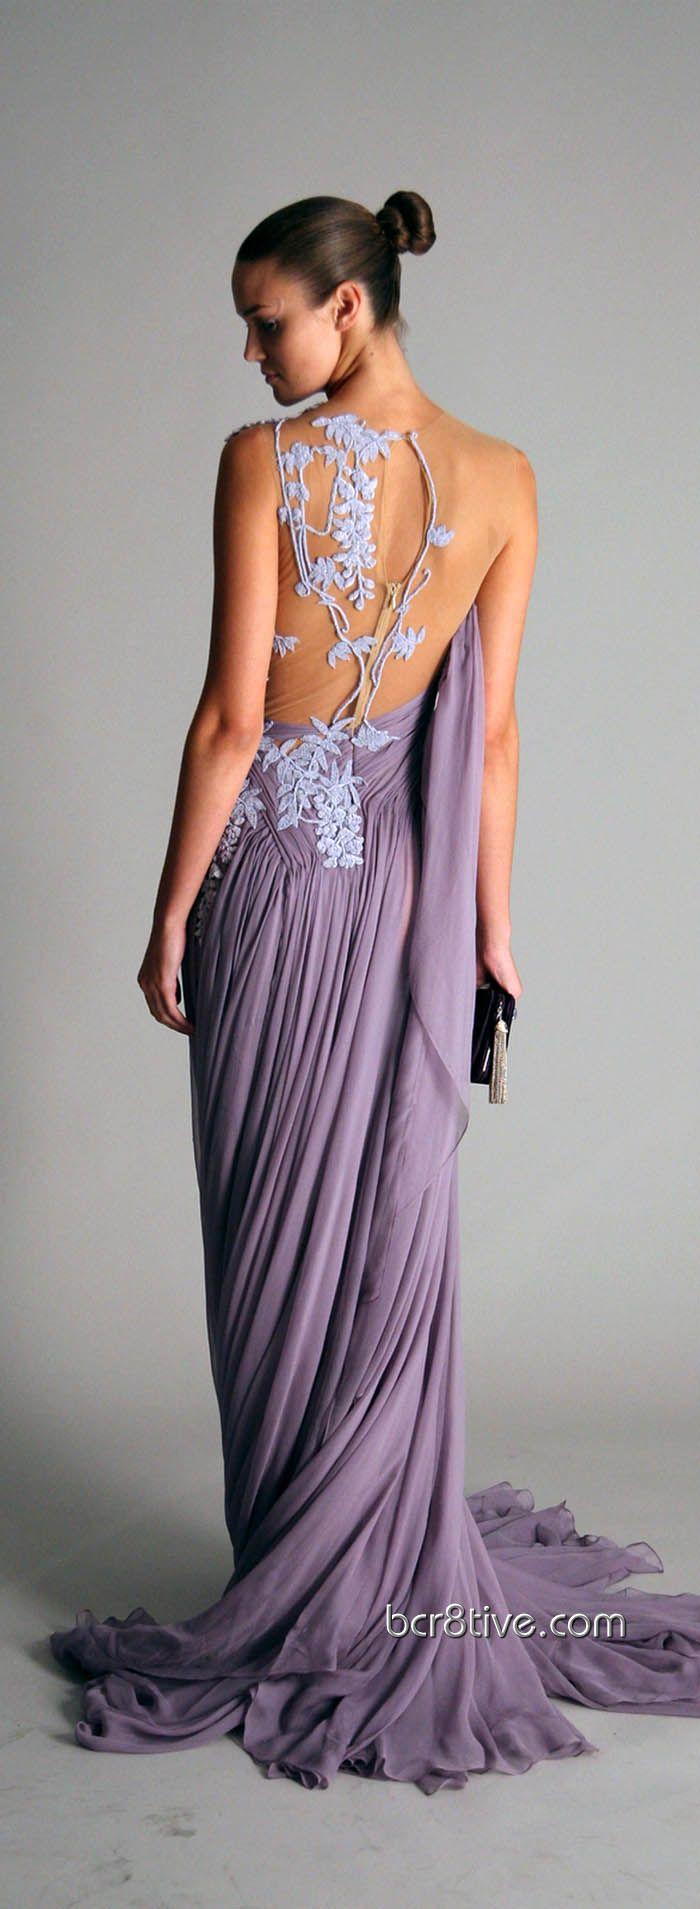 100 best Lavender images on Pinterest | Lavender, Purple lilac and ...